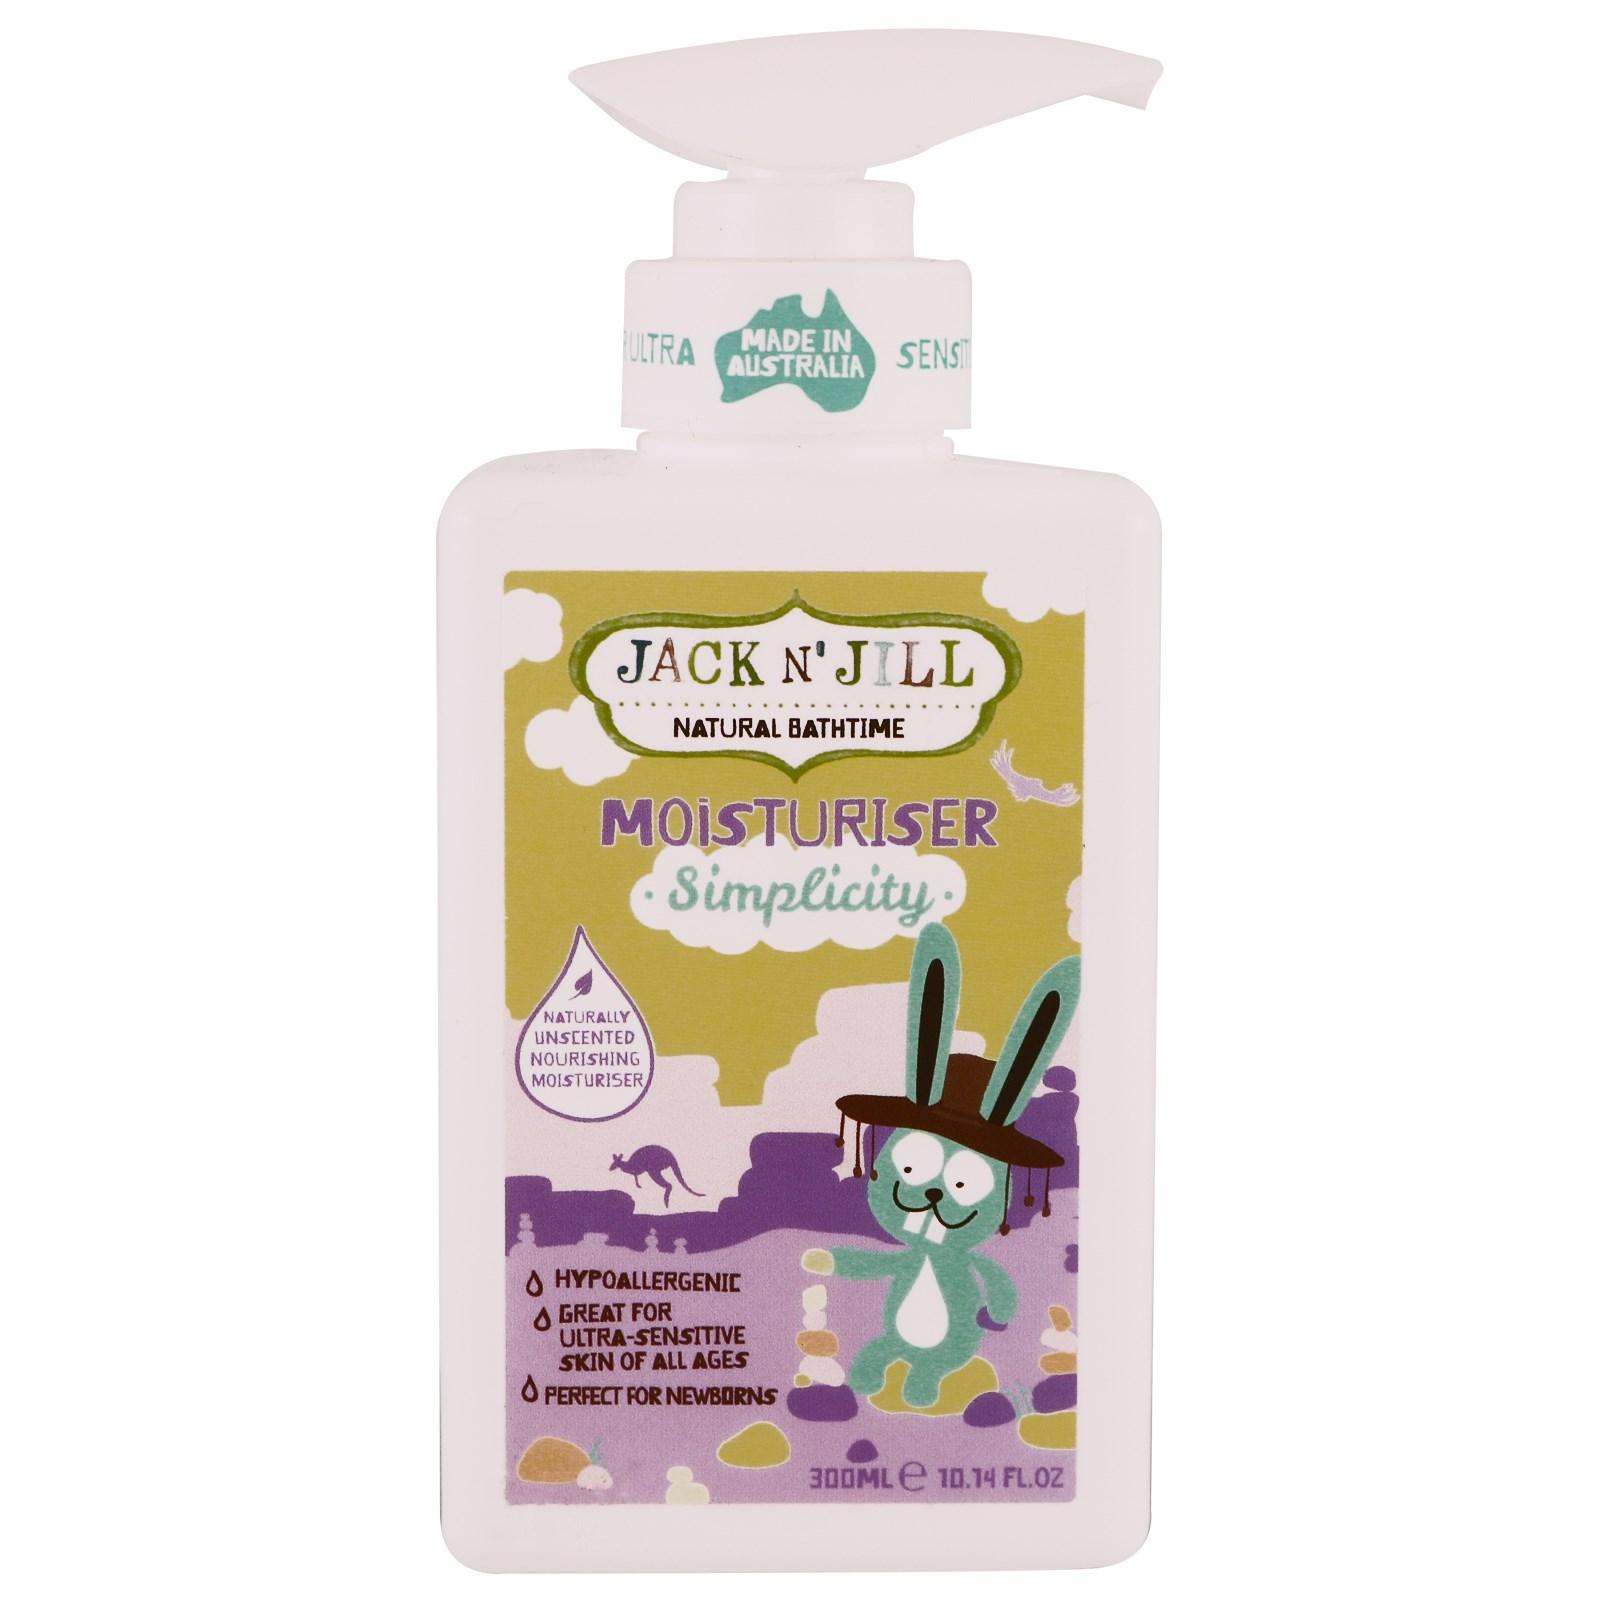 Jack N Jill Beauty Day Cream Natural Bathtime Moisturizer Simplicity 1014 Fl Oz